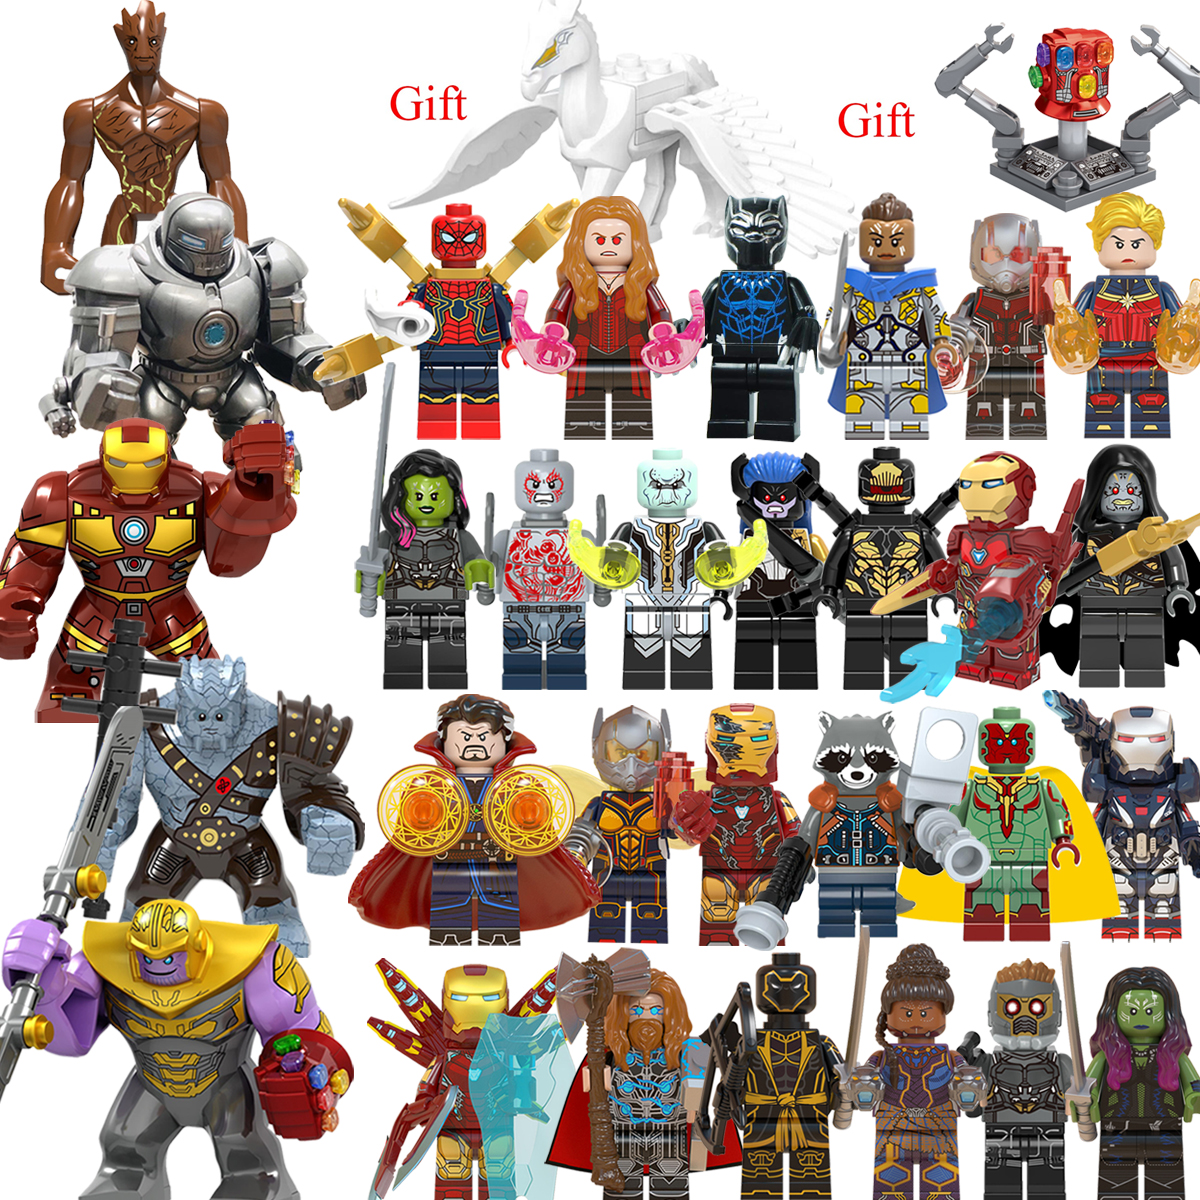 30PCS  Thanos Endgame  Iron Man Captain  War Machine  LEGOEDING   Marvel  Avengers Minifigured Building Blocks Toys For Children